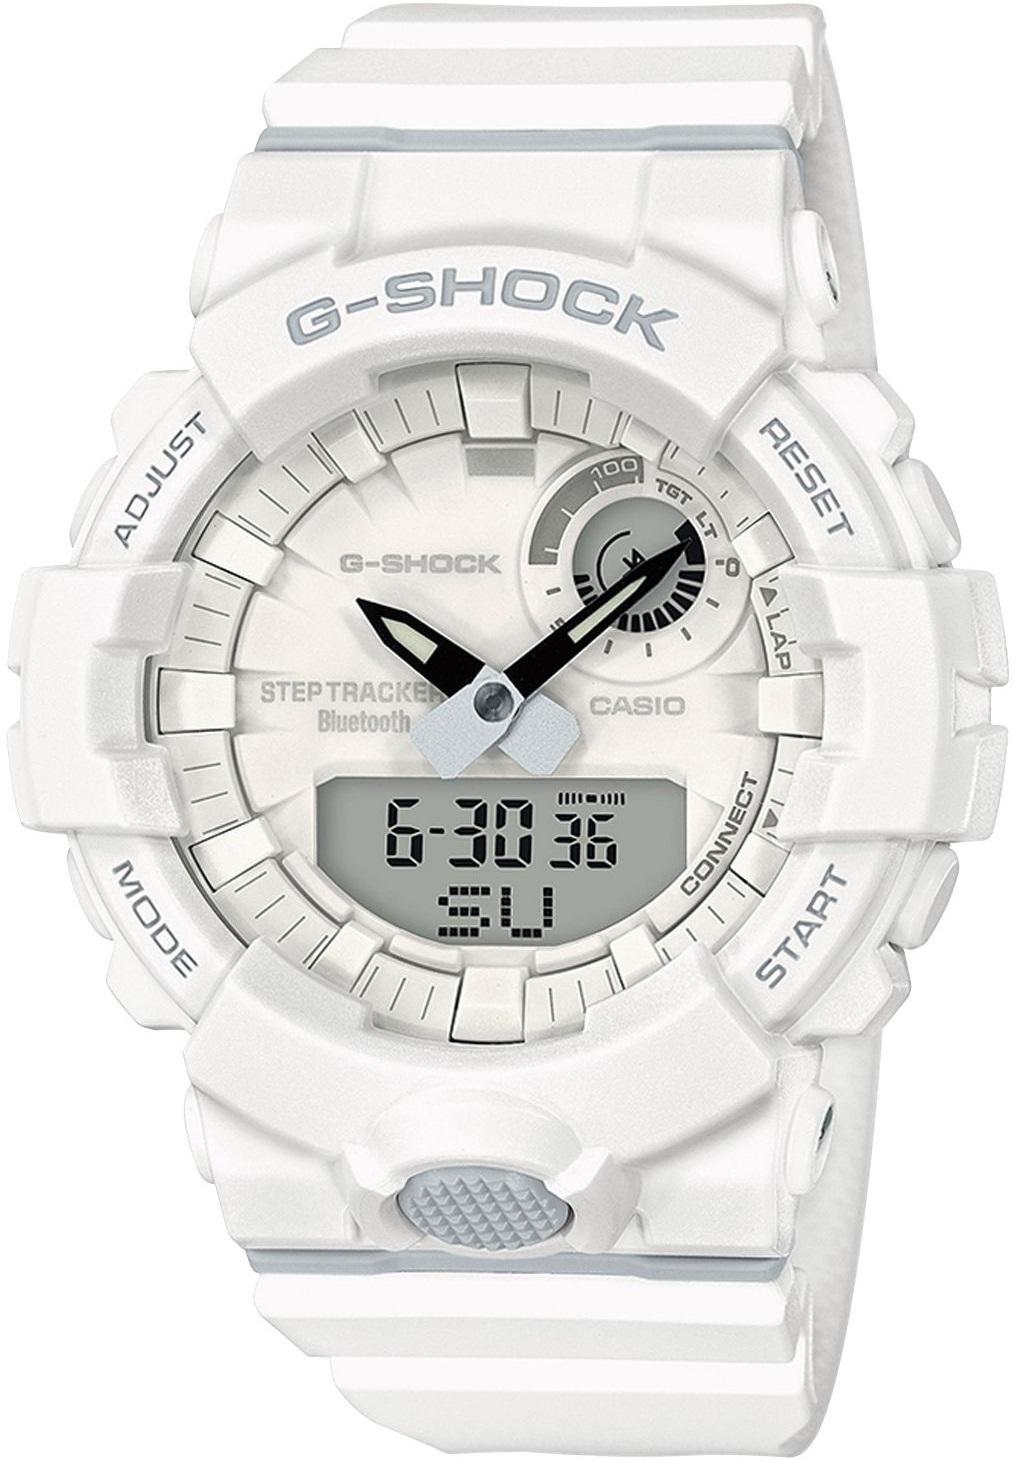 Мужские часы Casio G-Shock GBA-800-7AER